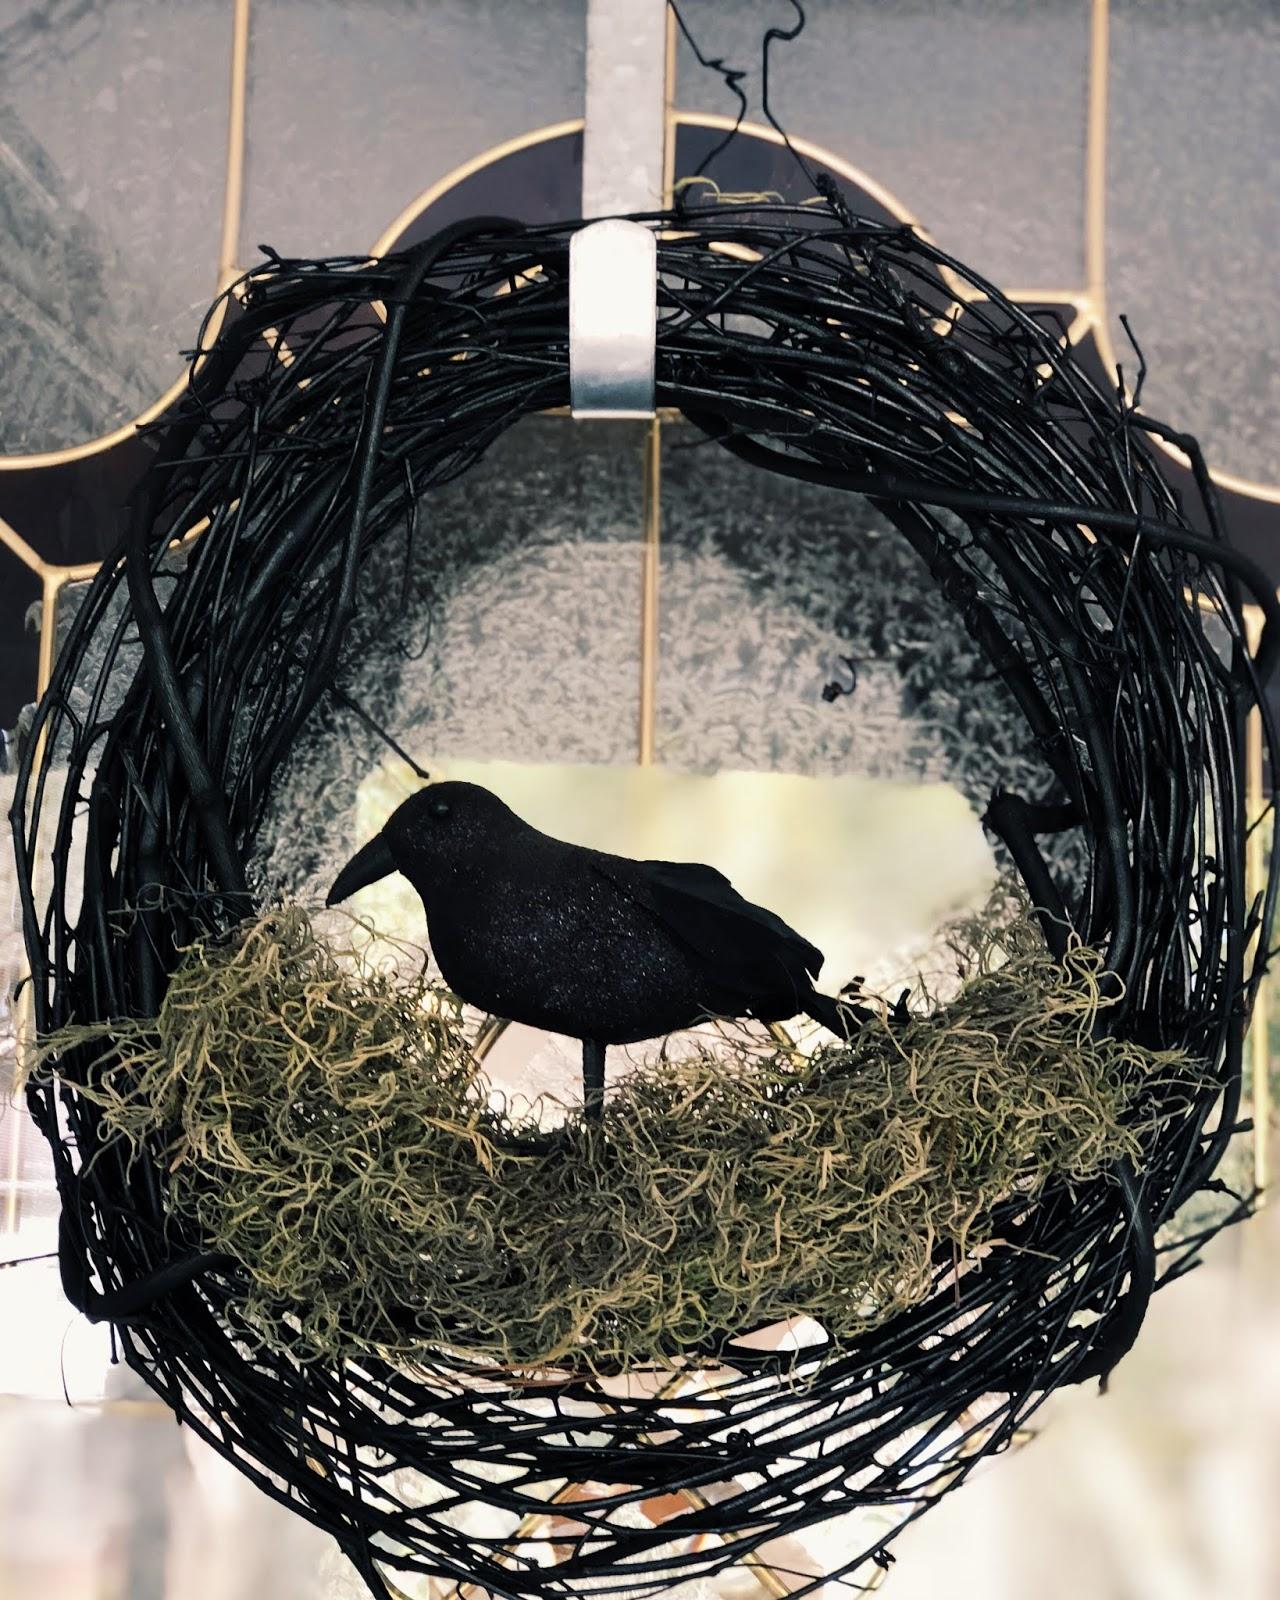 DIY Raven Wreath